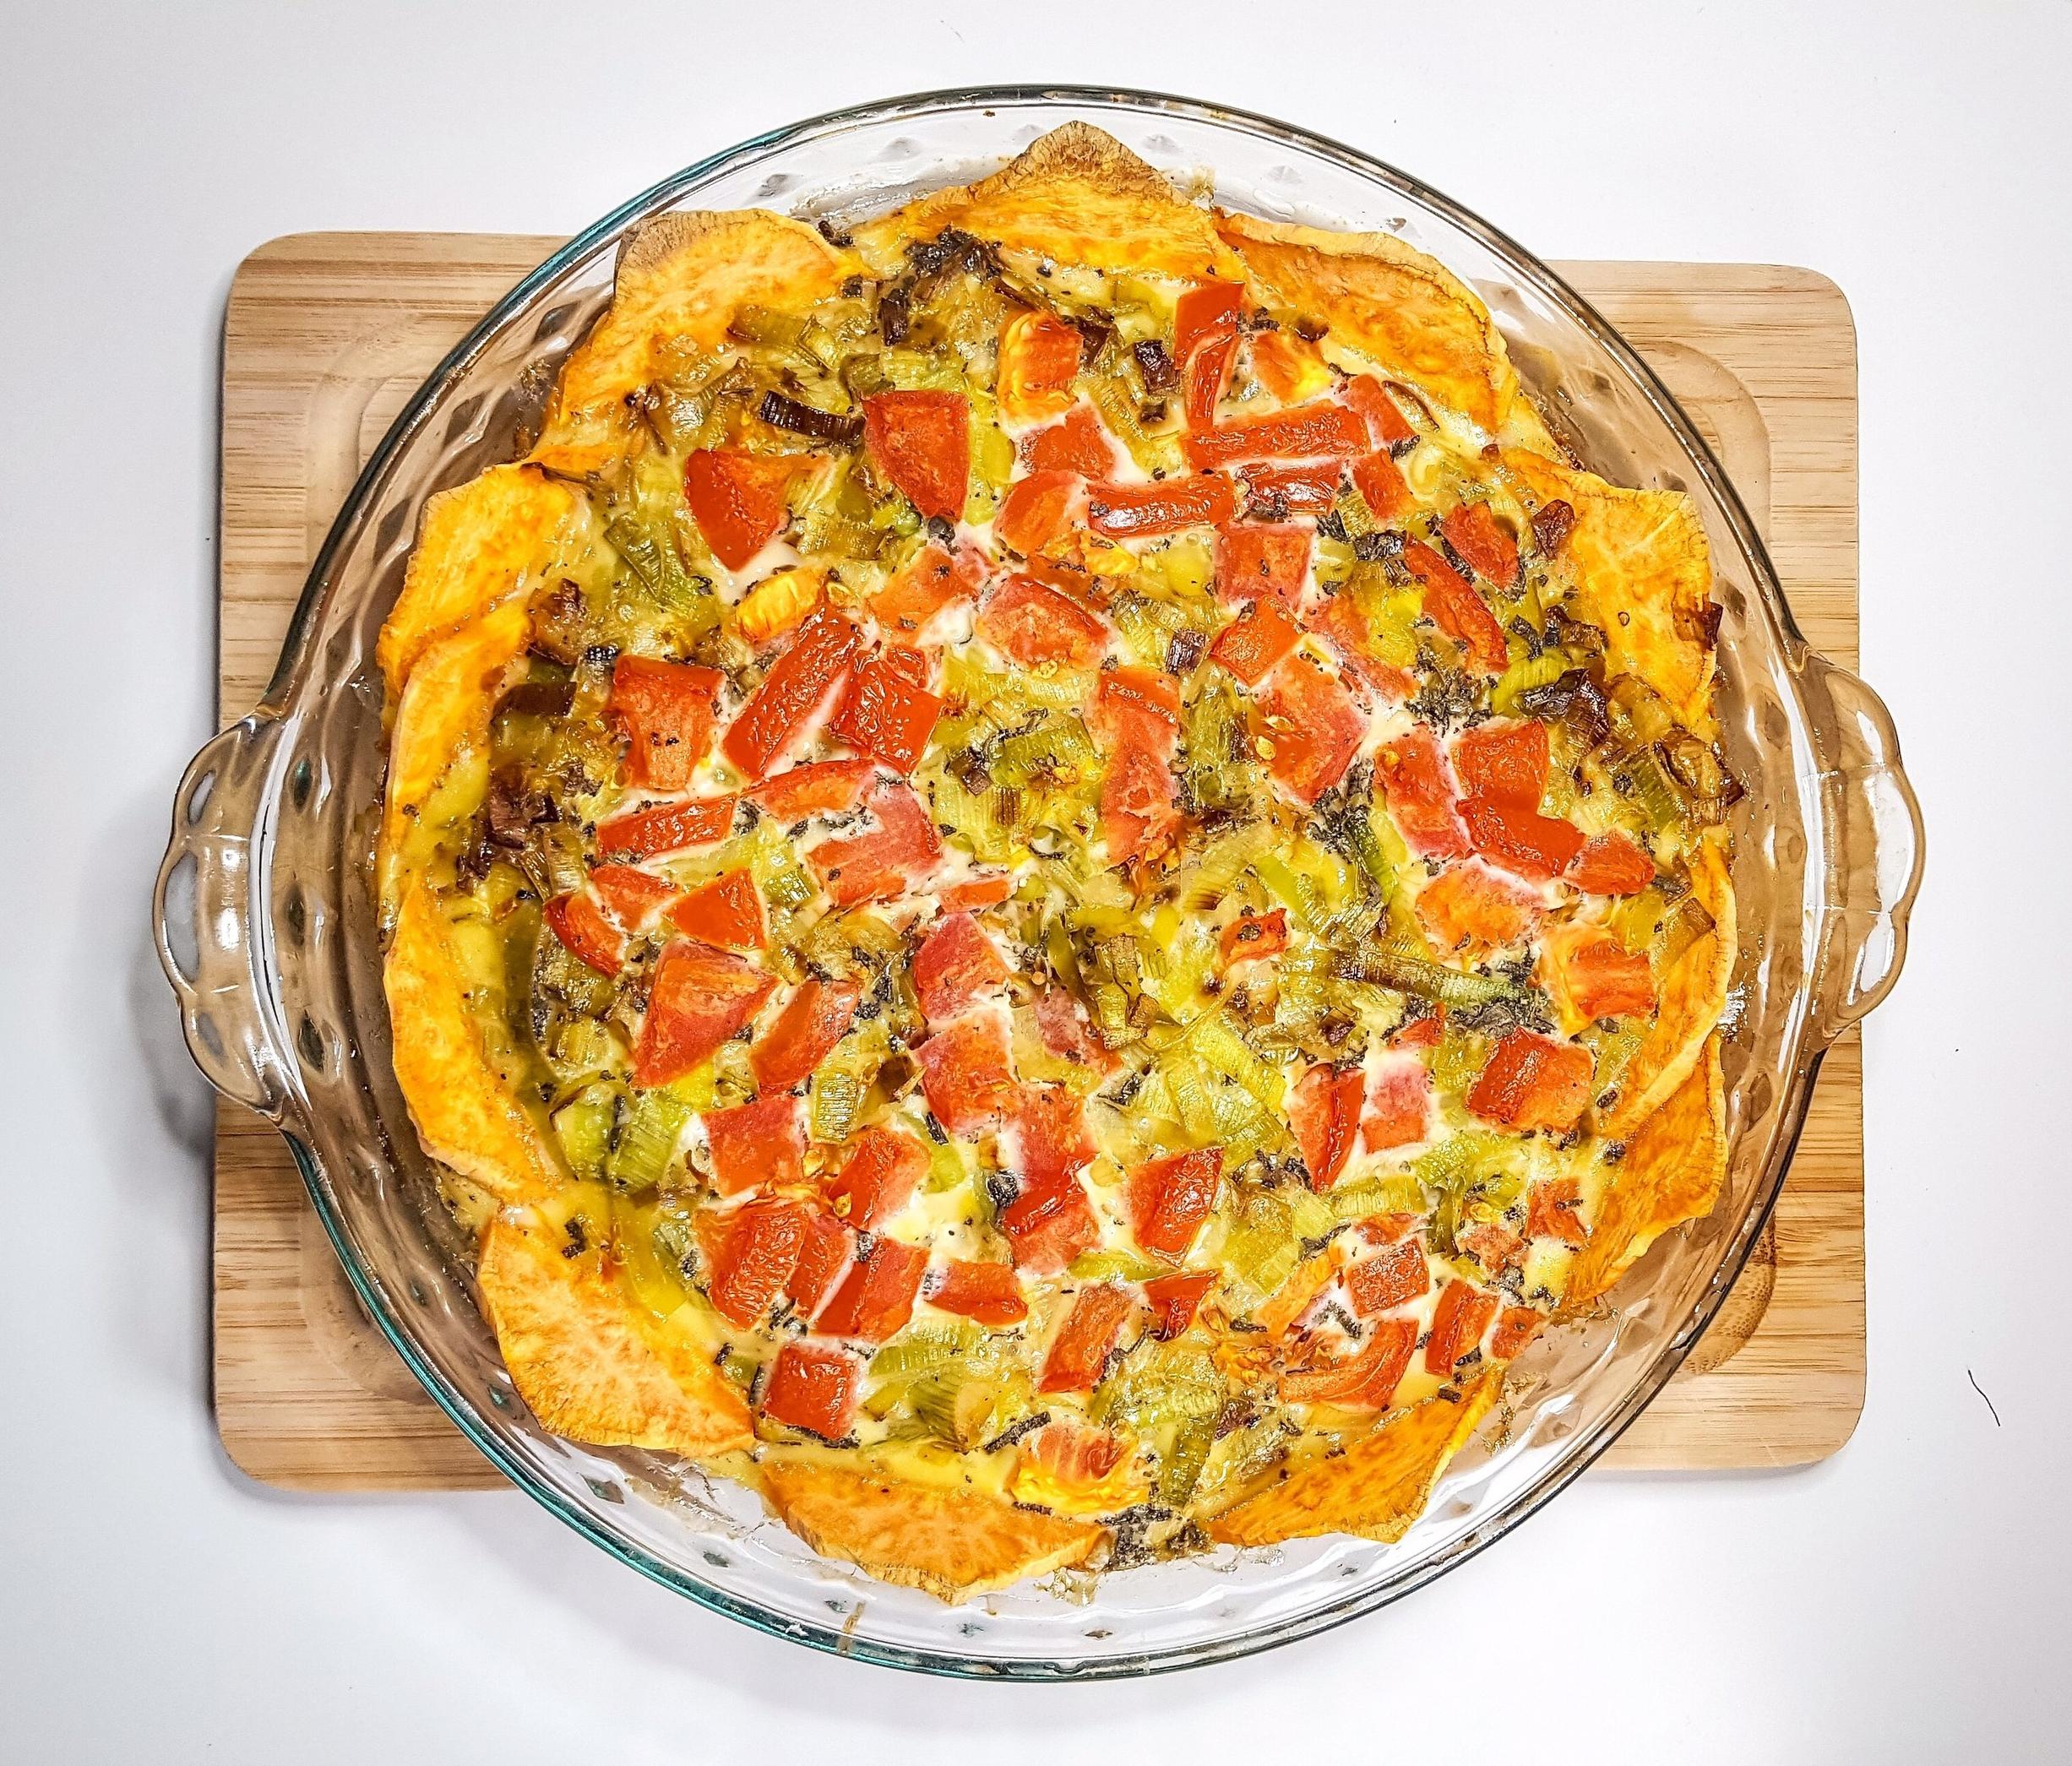 Leek & Tomato Quiche with Crispy Sweet Potato Crust